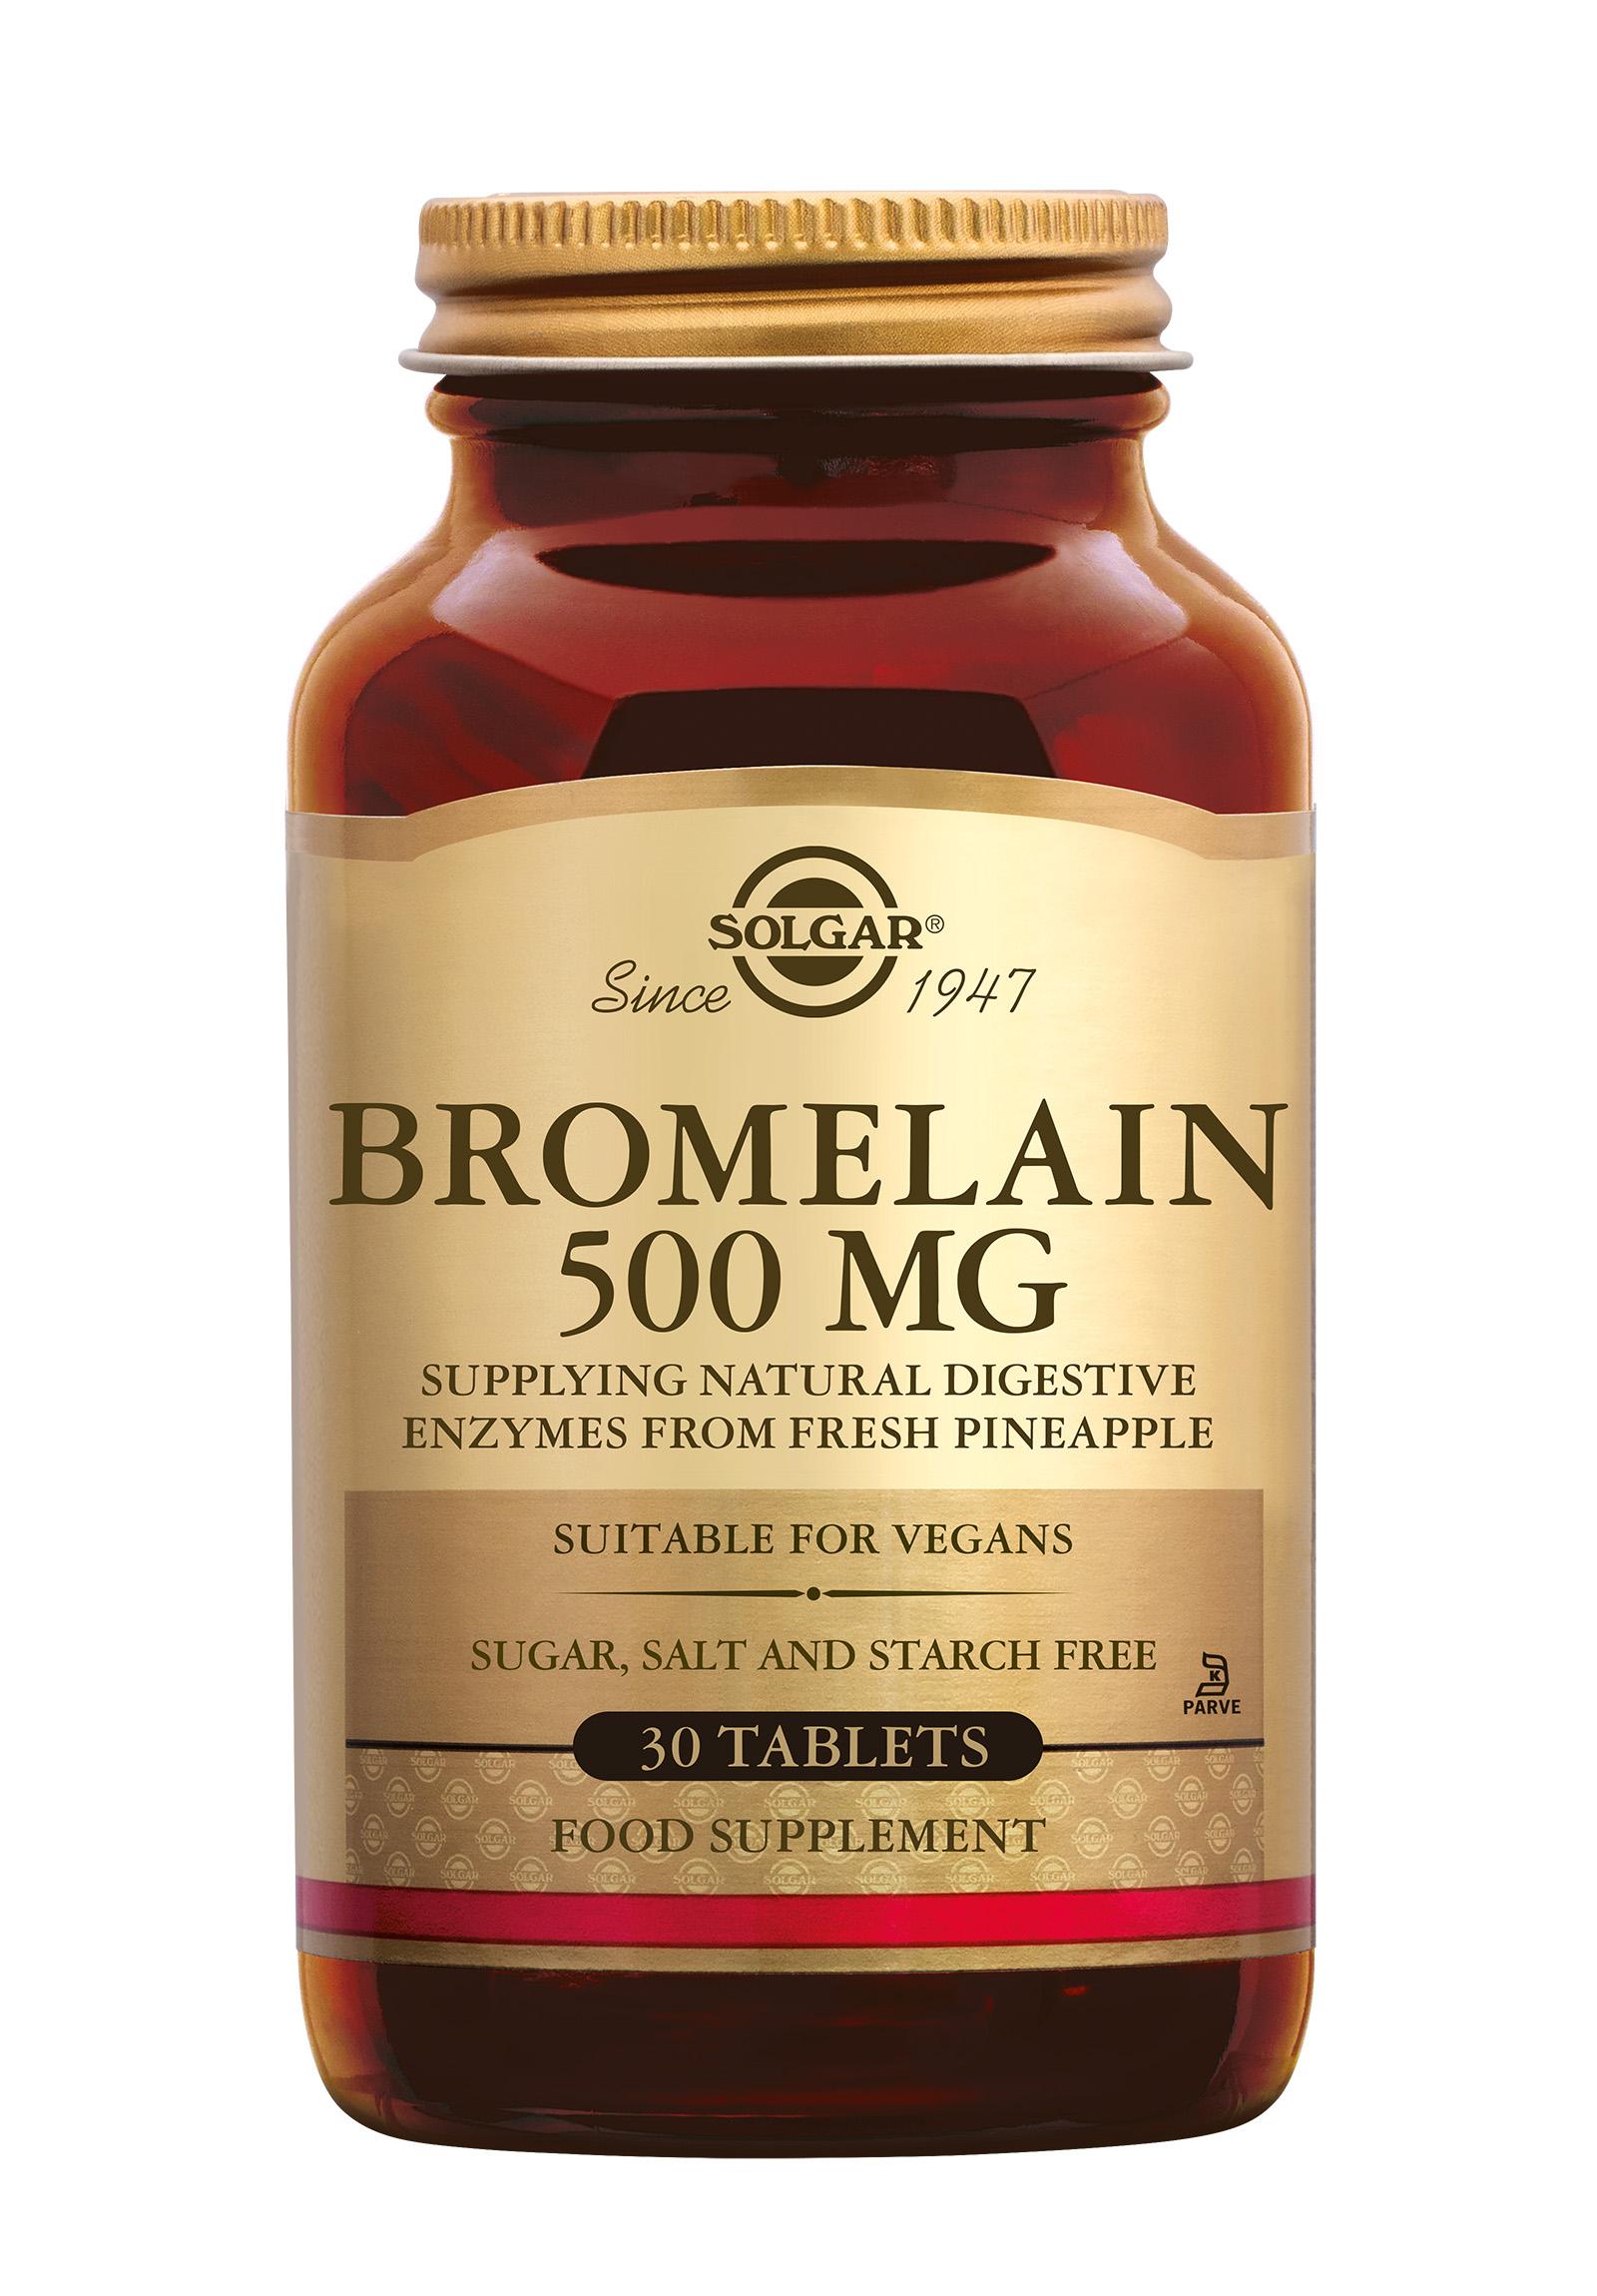 Bromelain 500 mg, Solgar, Solgar Bromelaïn 500 mg bevat 500 mg bromelaïne.